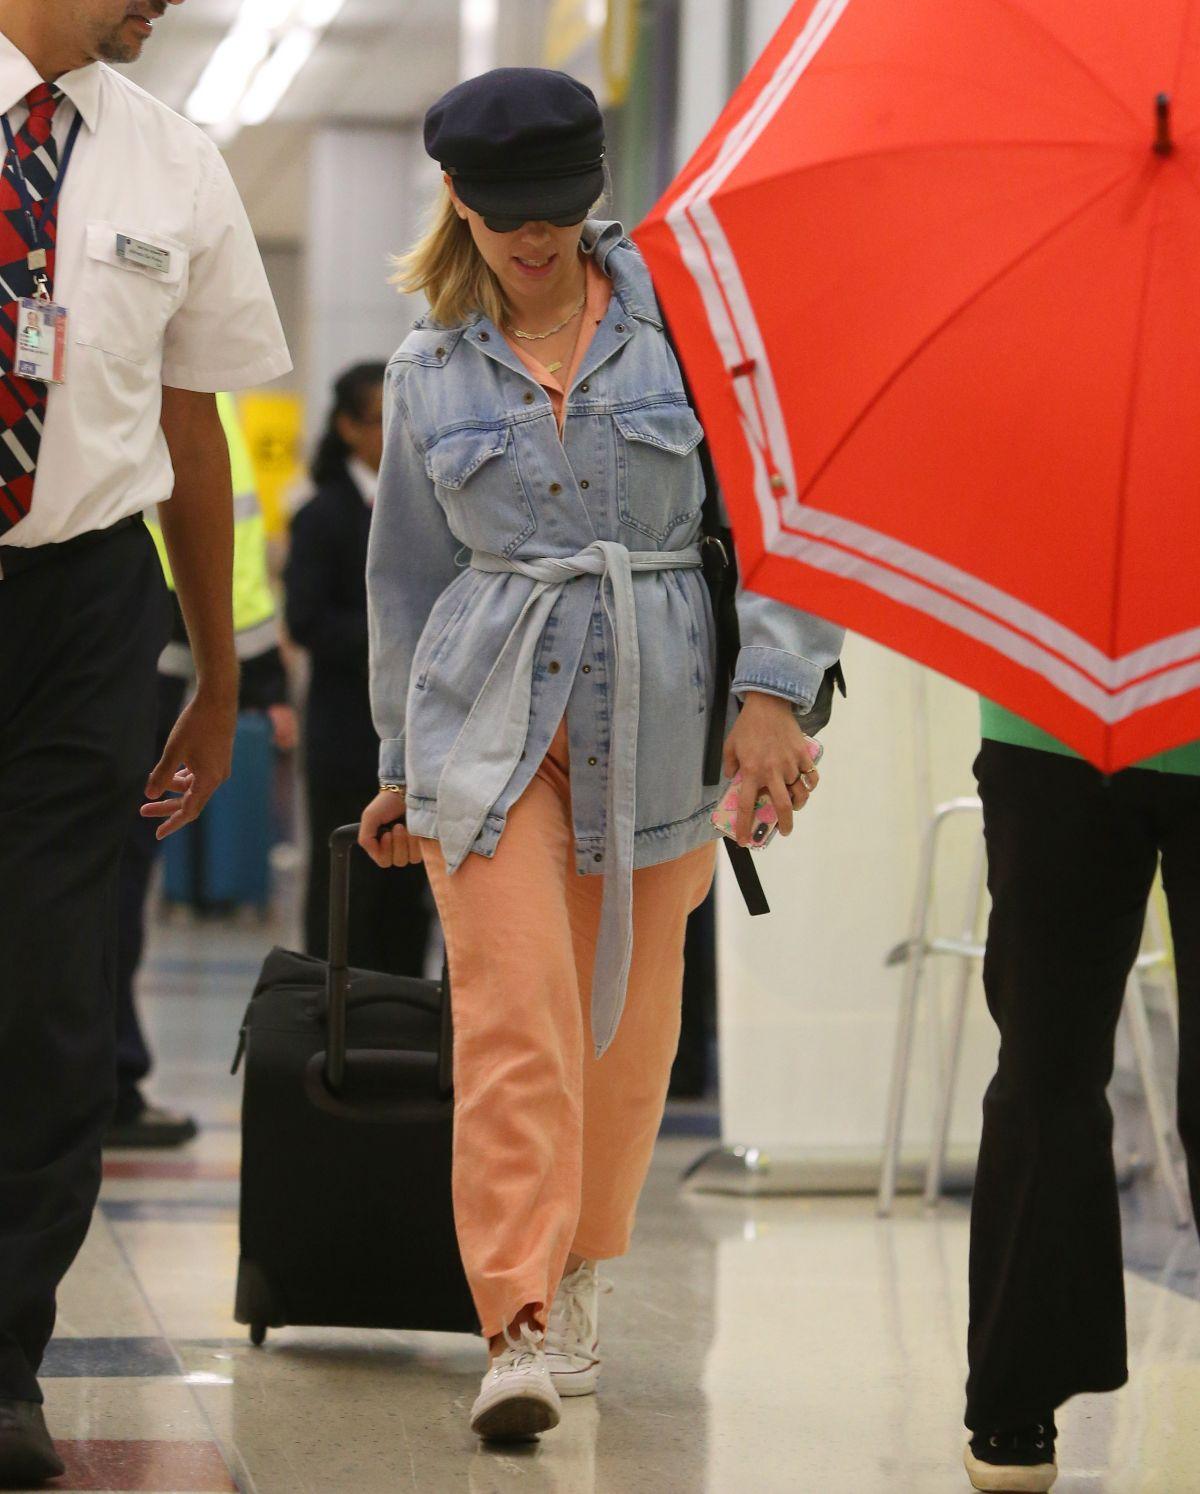 Scarlett Johansson Aarrives At Jfk Airport In New York 09 06 2019 Hawtcelebs